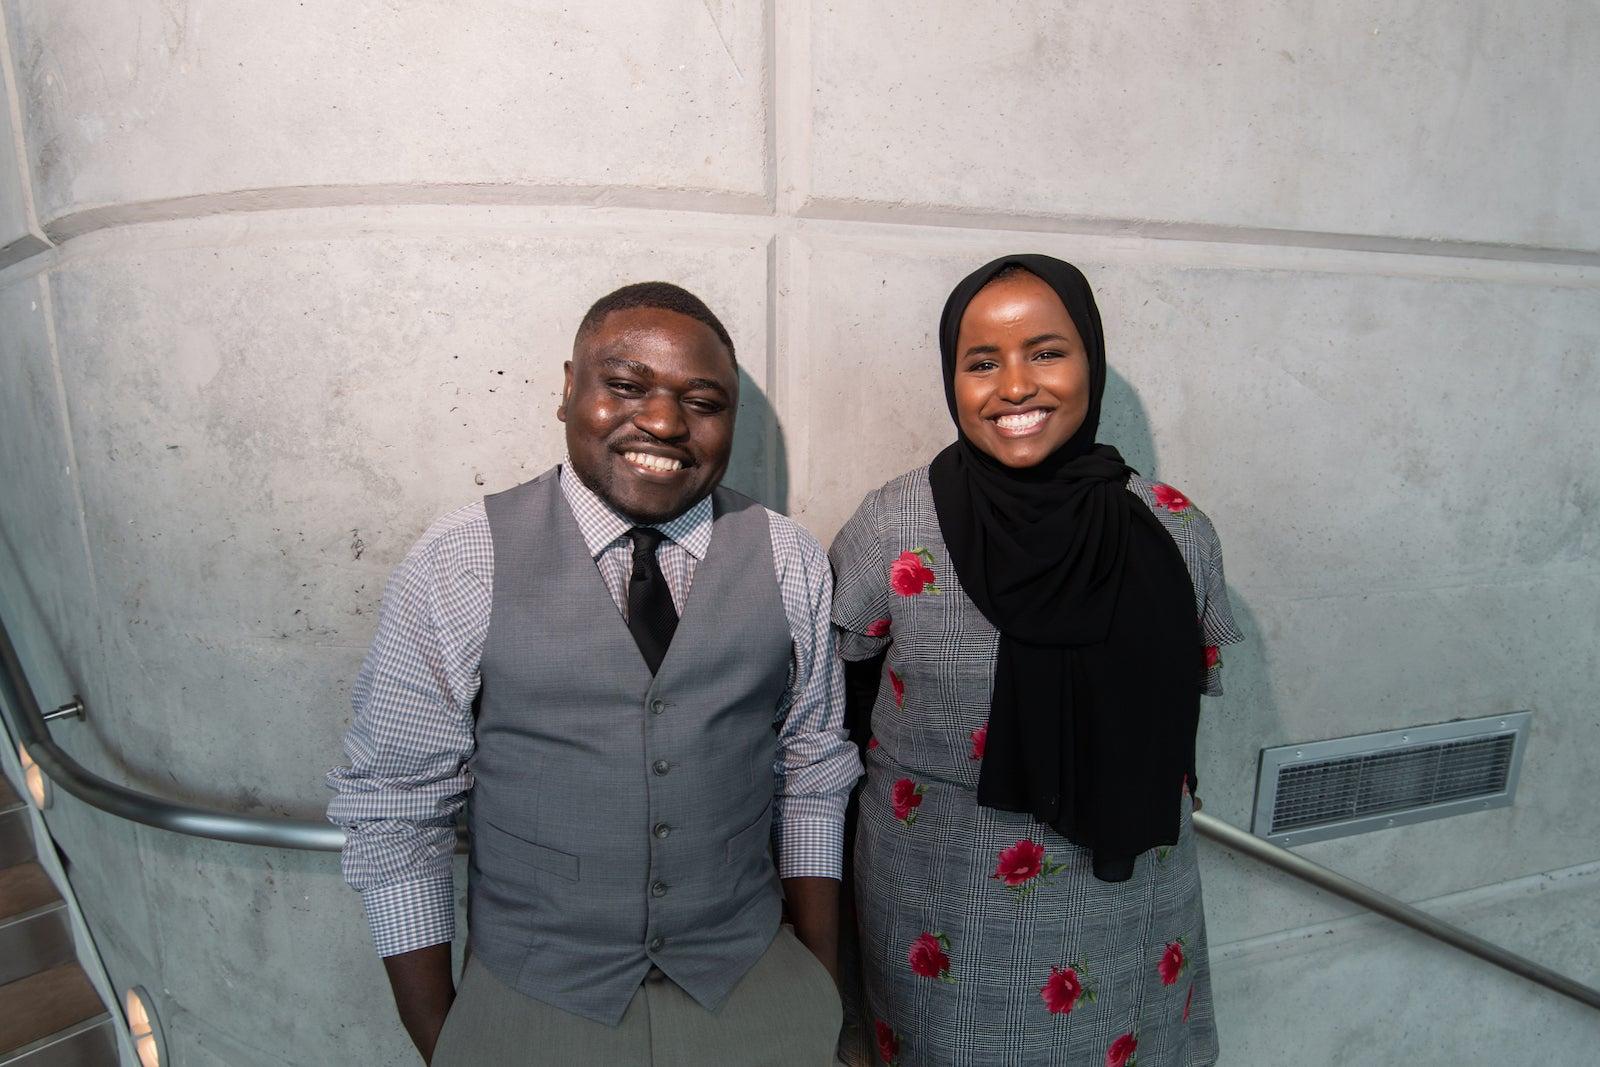 From left: Shukuru Kamulete and Halima Hamud, photo Patrick Sweeney